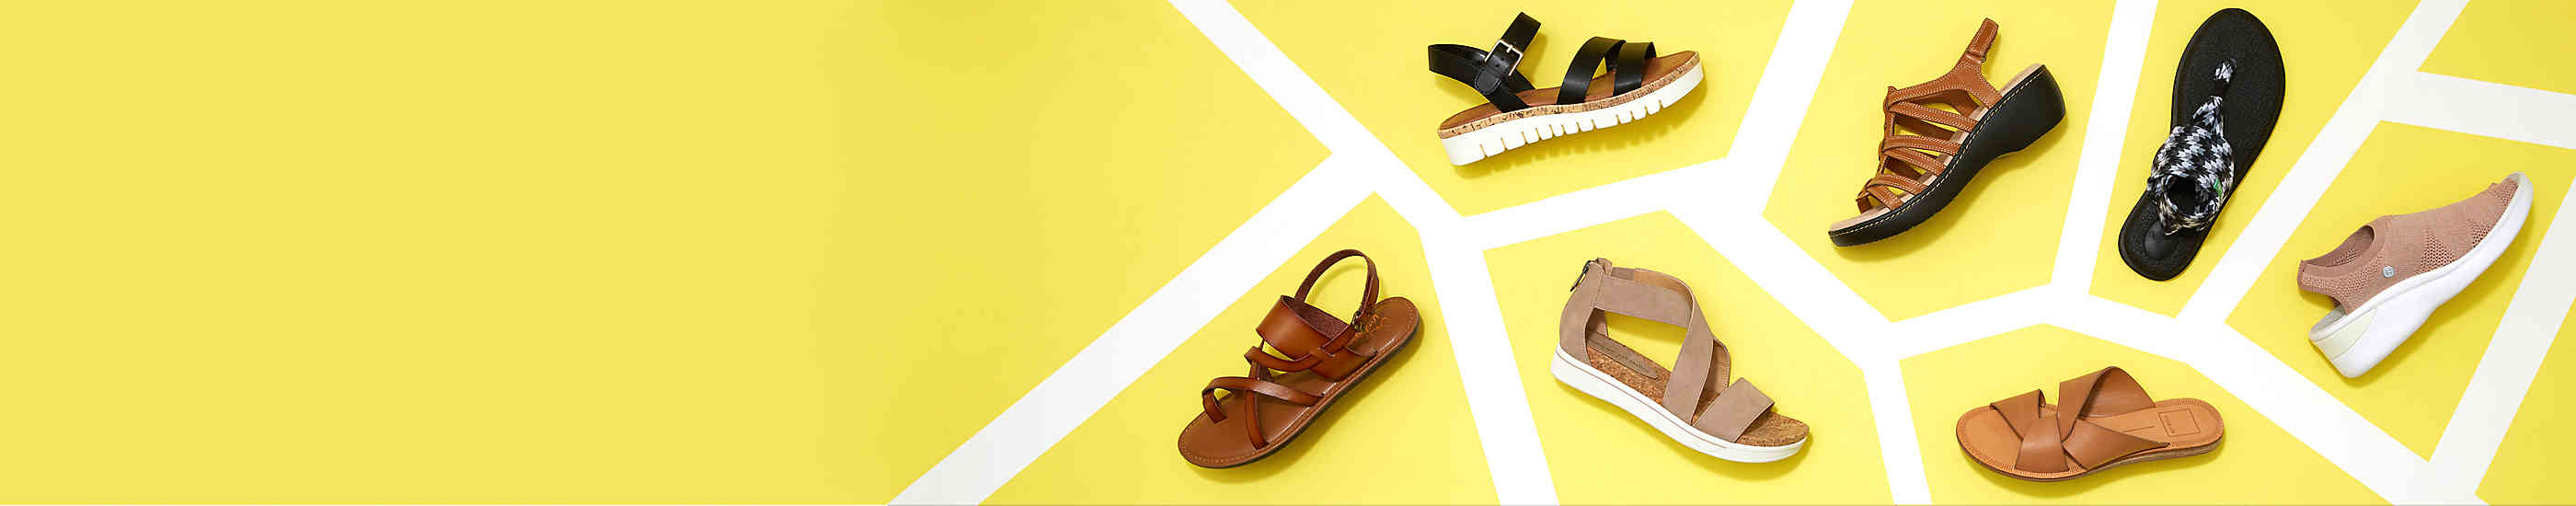 e33433c70 Women s Casual Sandals   Summer Shoes